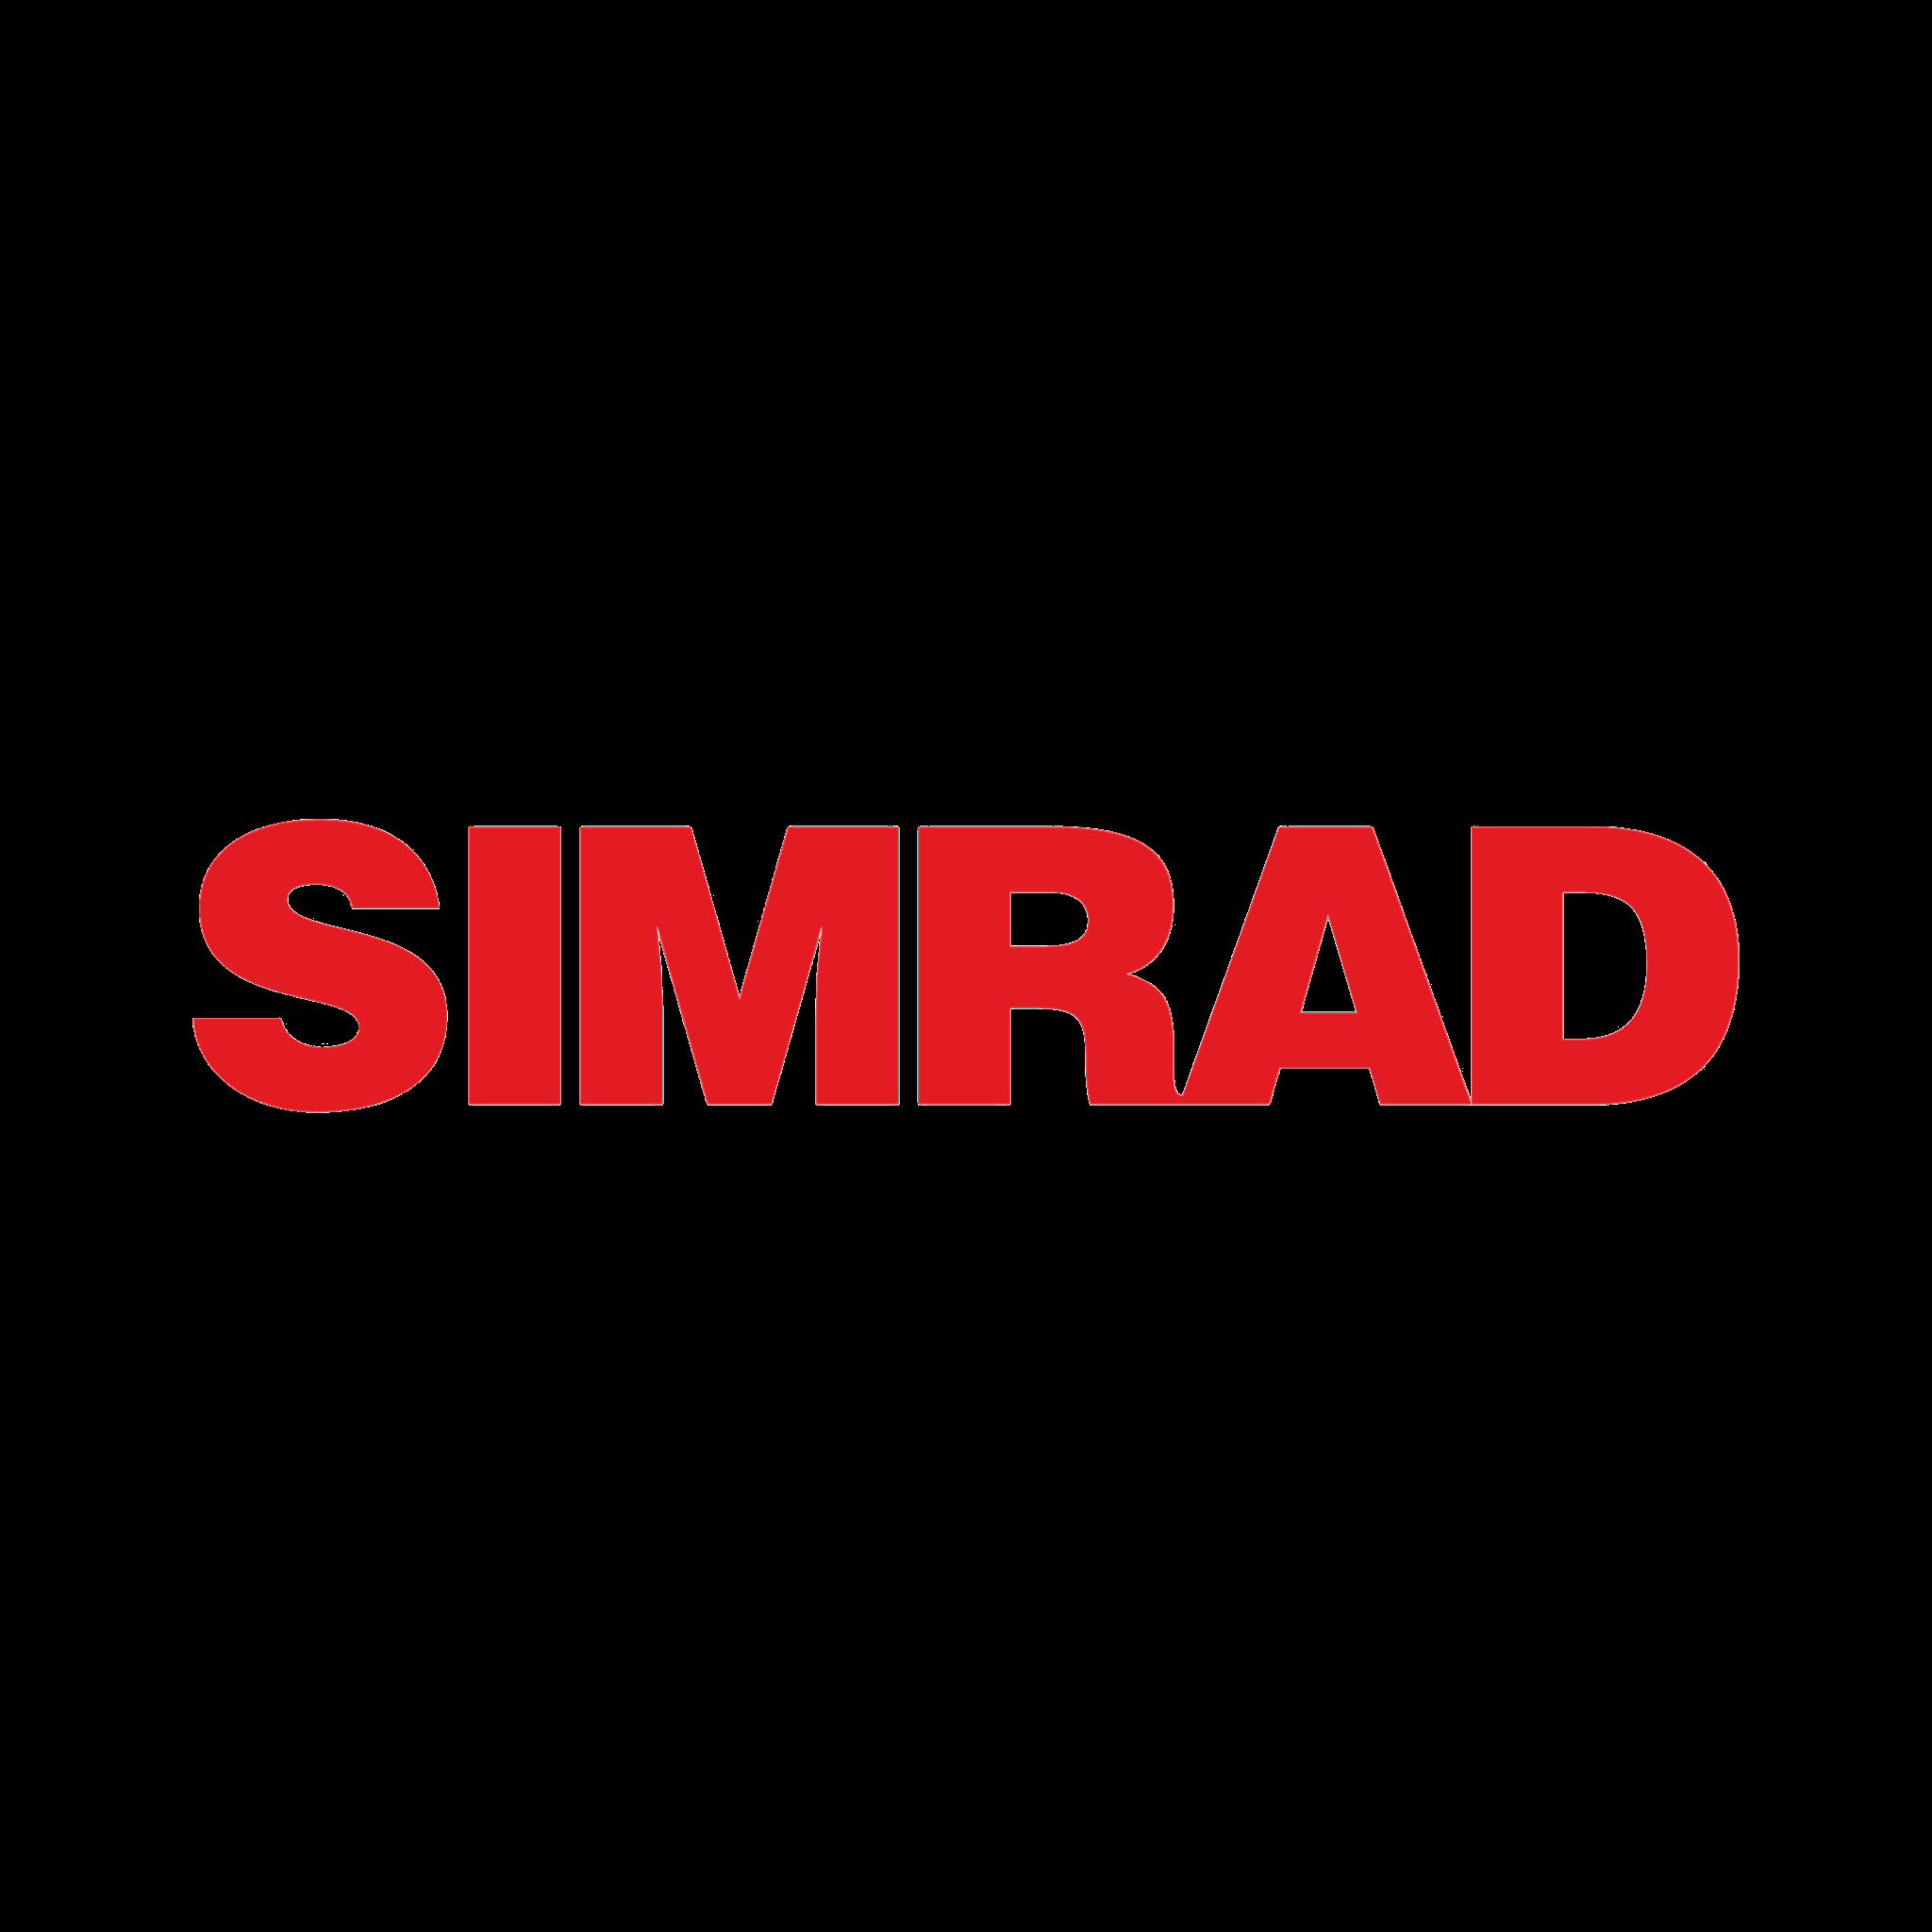 Simrad logo png.PNG